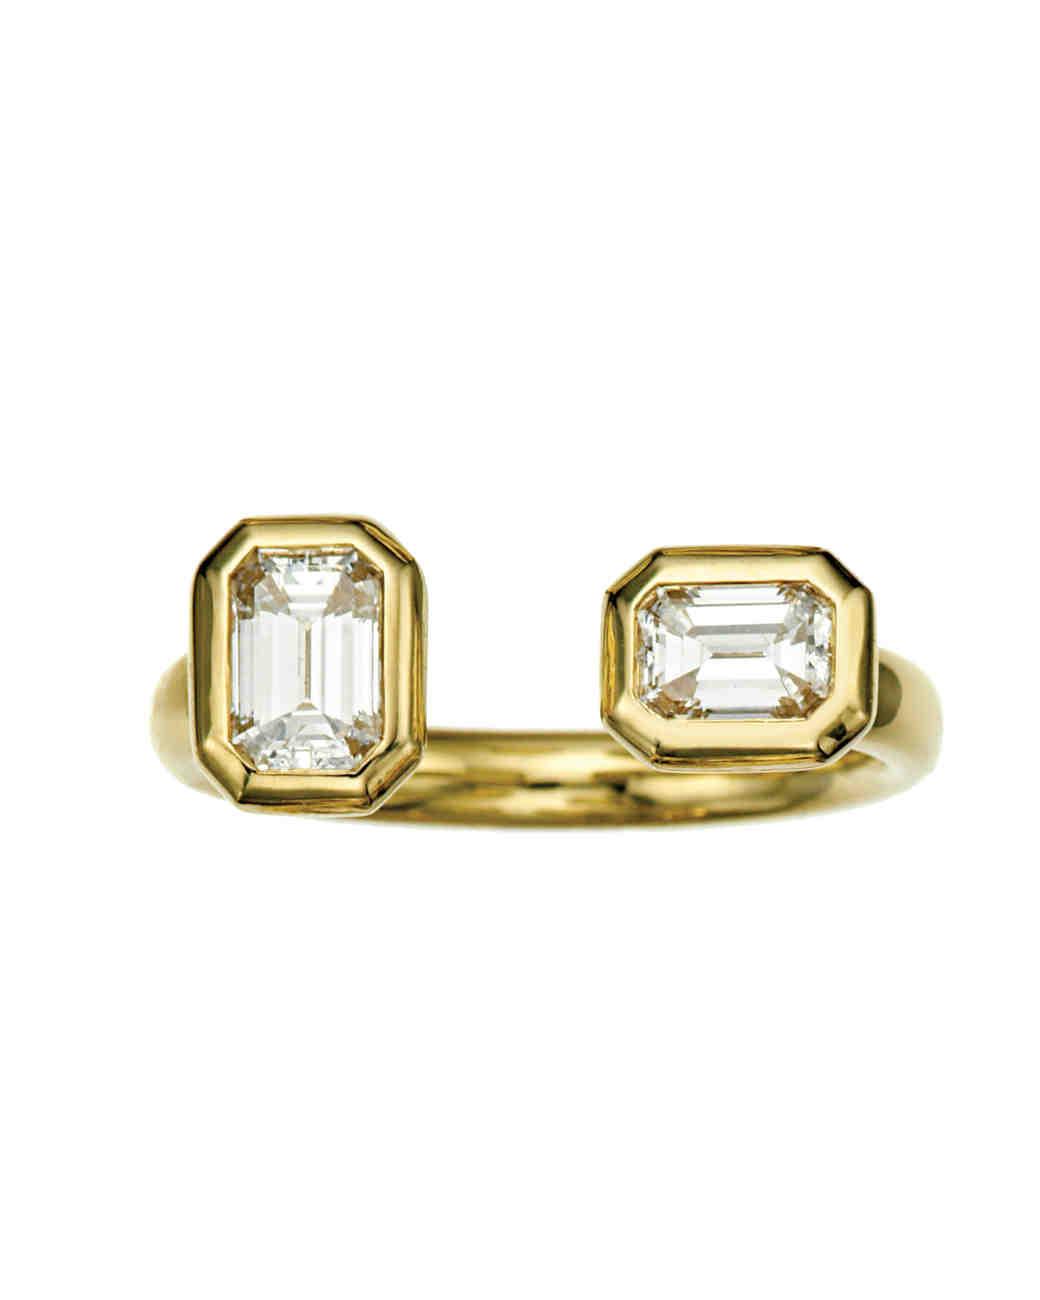 engagement-ring-trends-jemma-wynne-1215.jpg